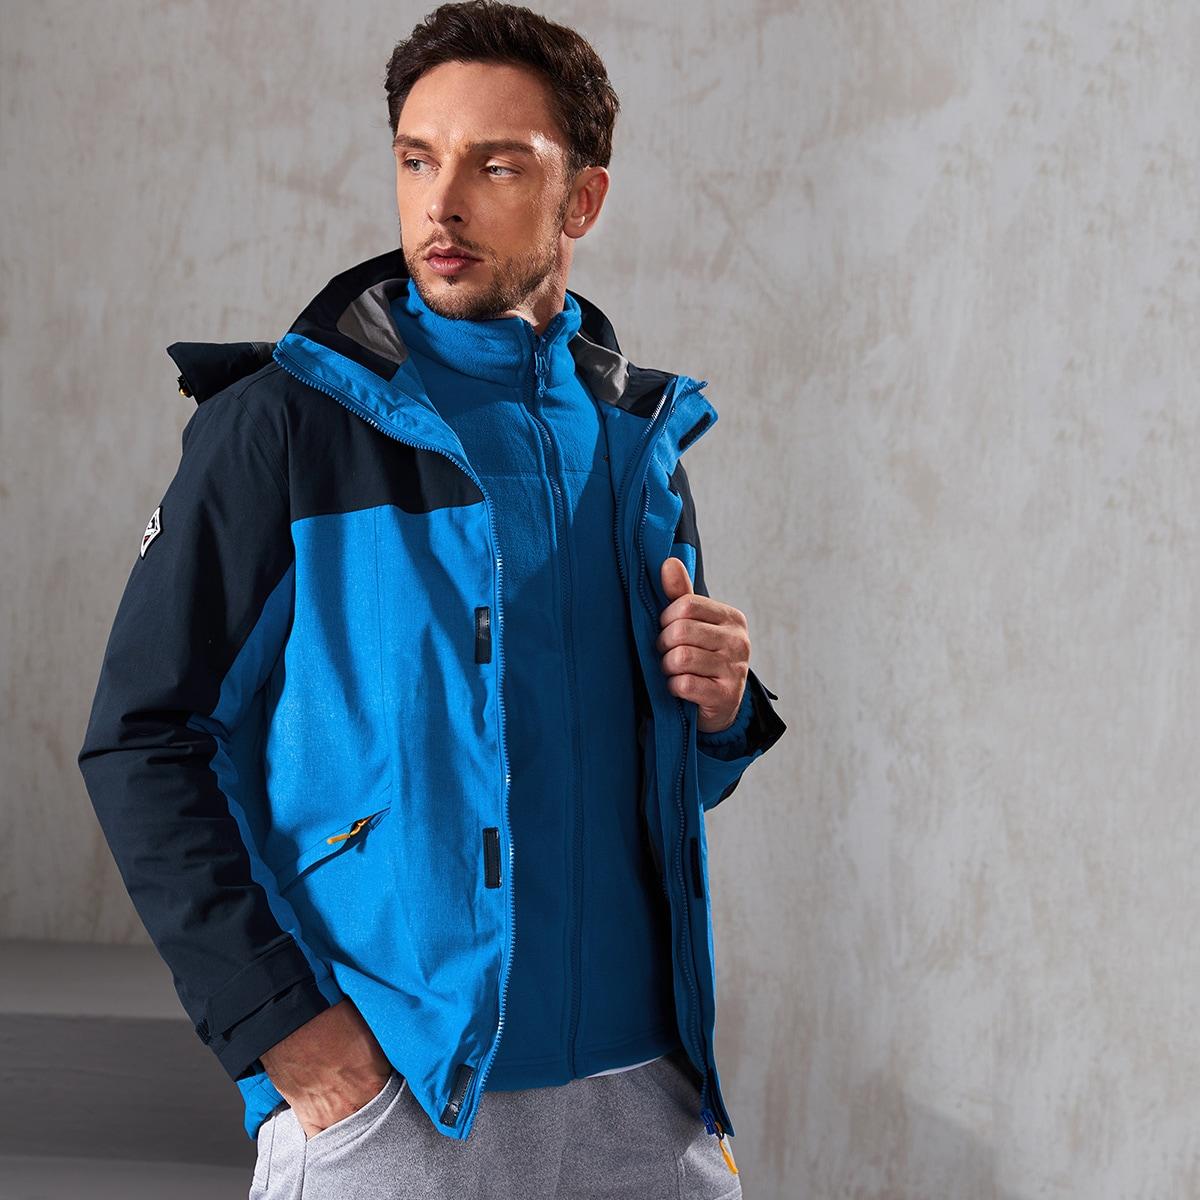 Men Two Tone Detachable Fleece Lined Hooded Sports Jacket